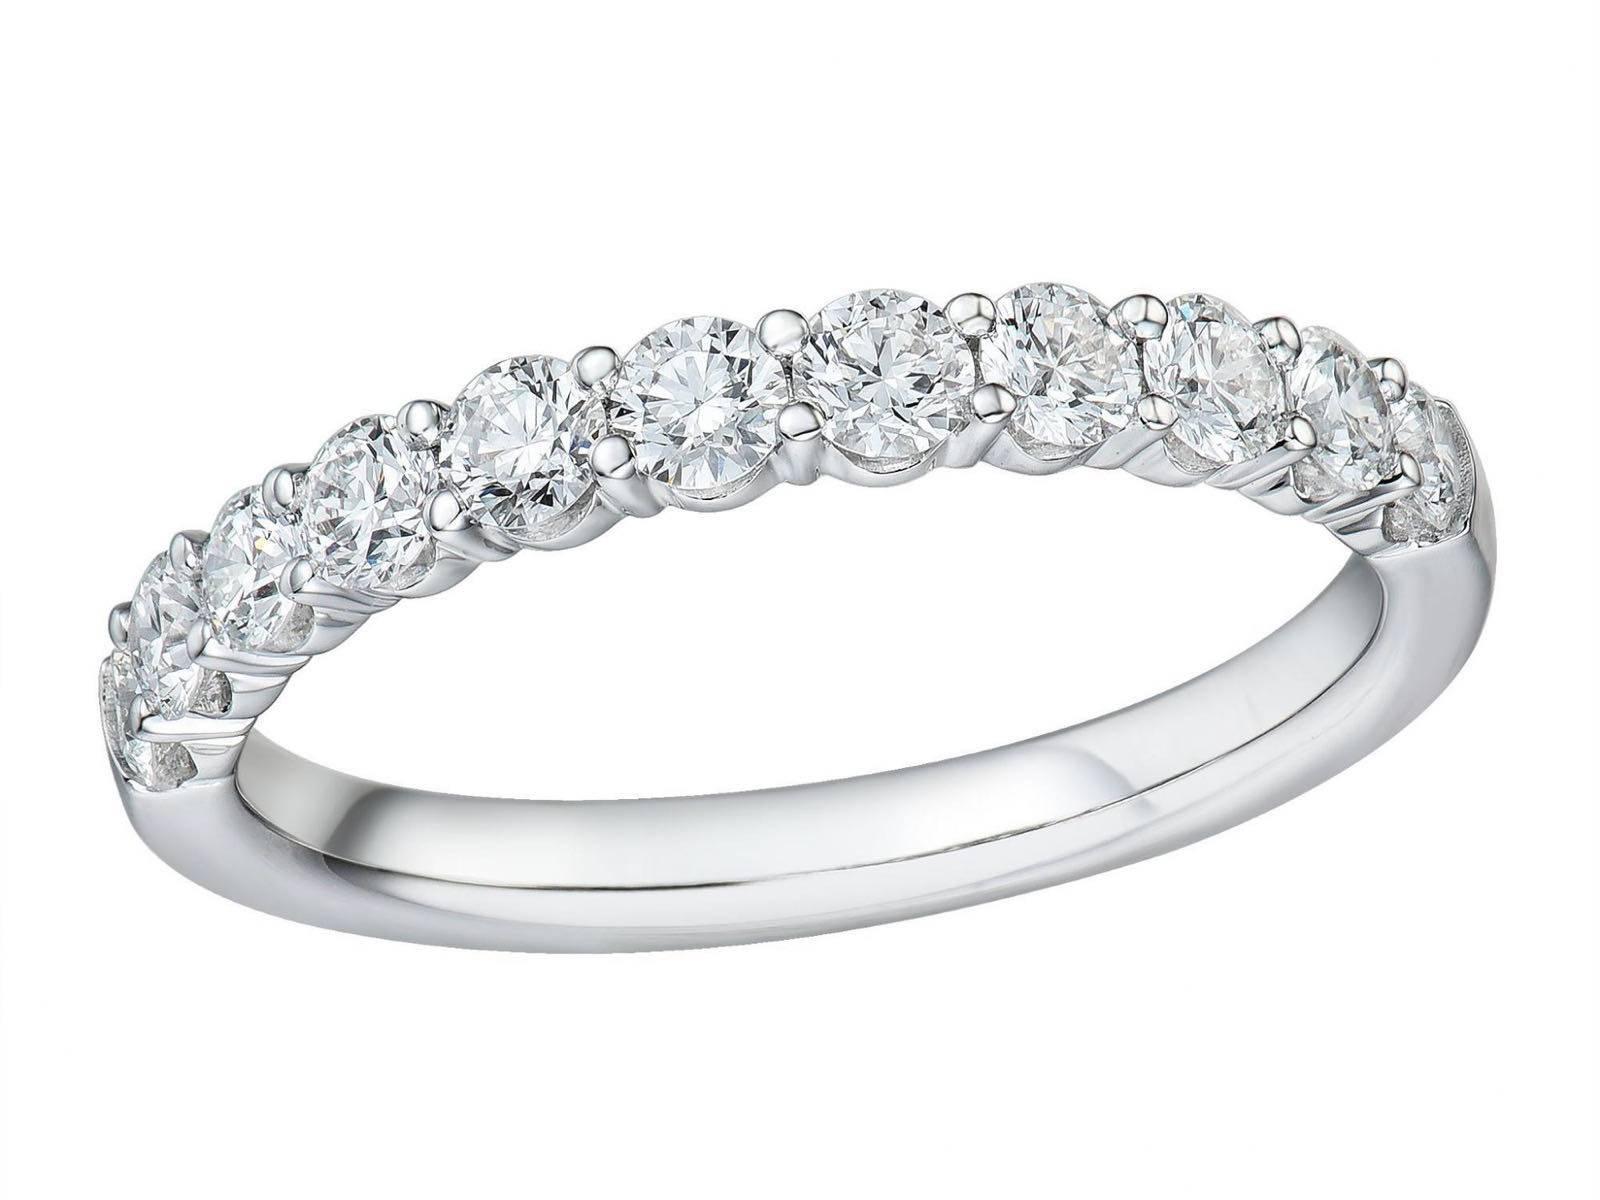 Juwelen Vanquaethem - House of Weddings (5)